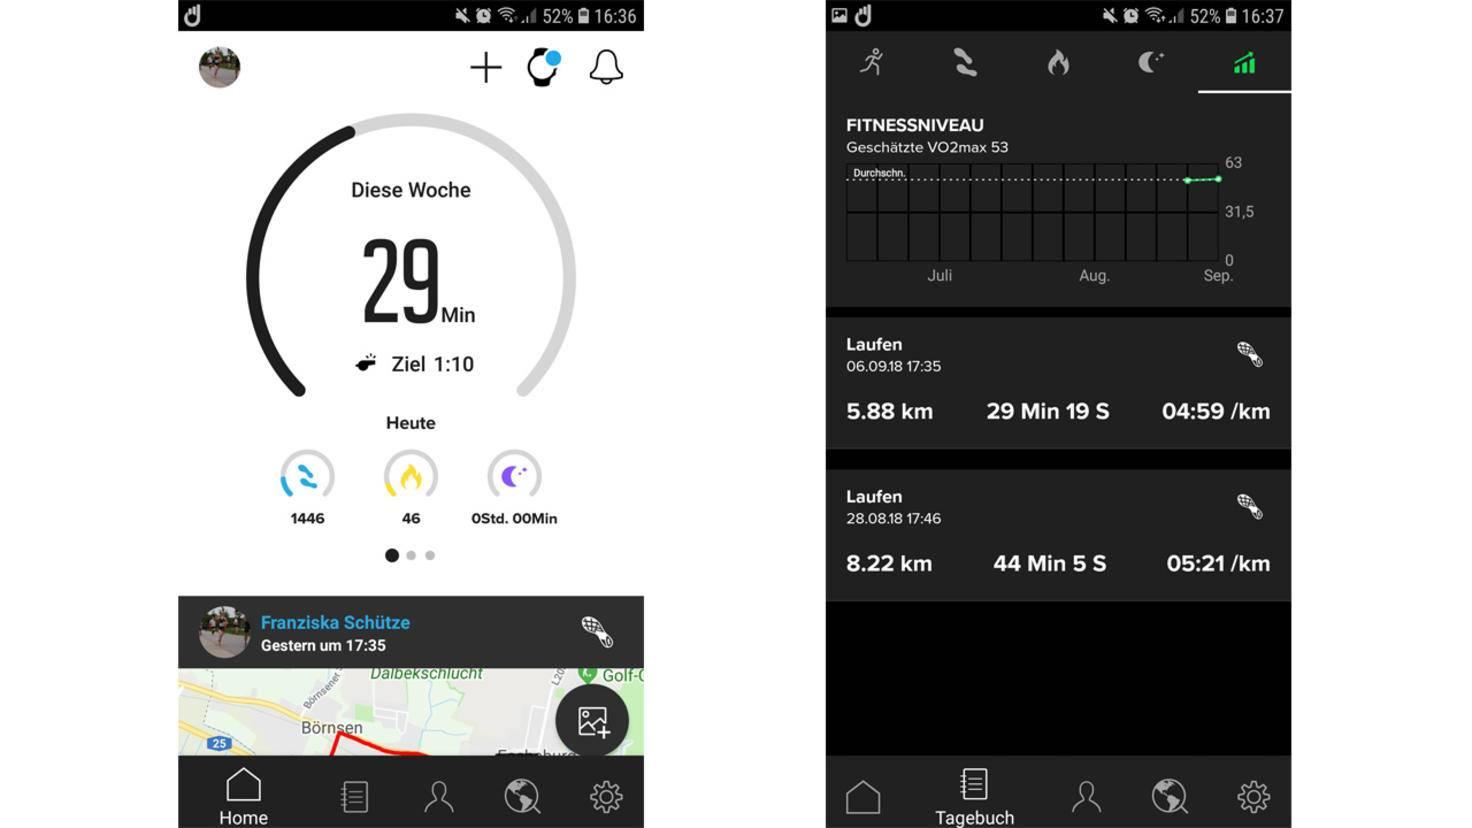 Sunnto 3 Fitness App 2